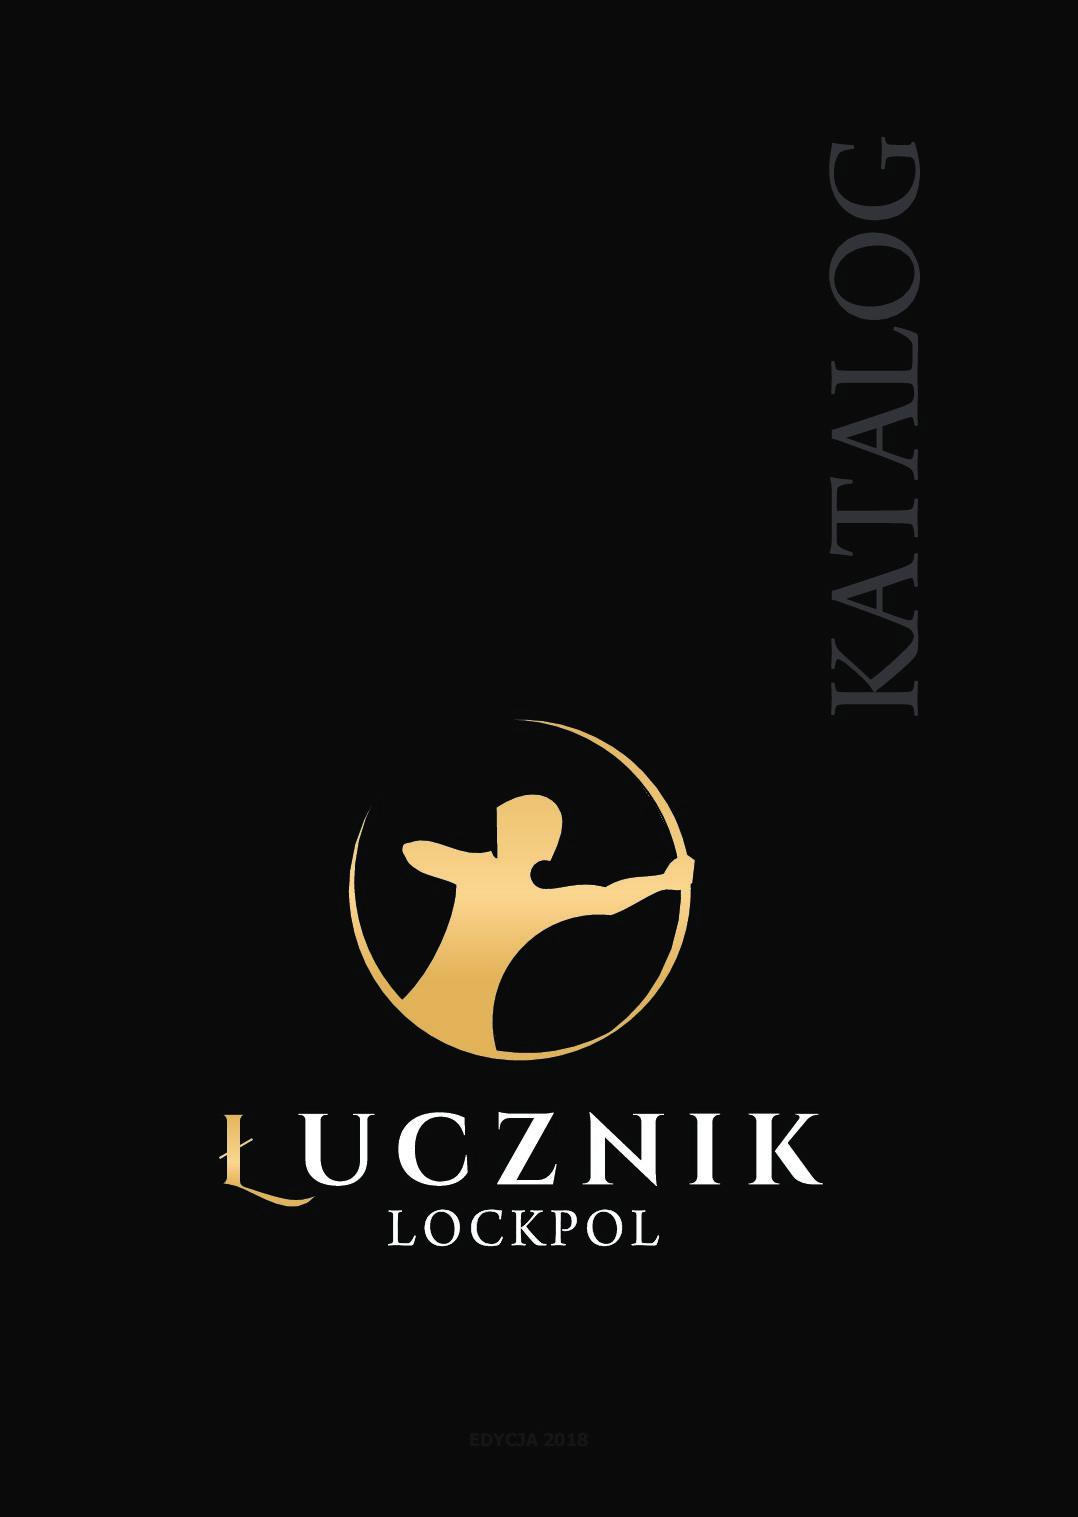 Do pobrania » Katalog Lucznik Lockpol min pdf